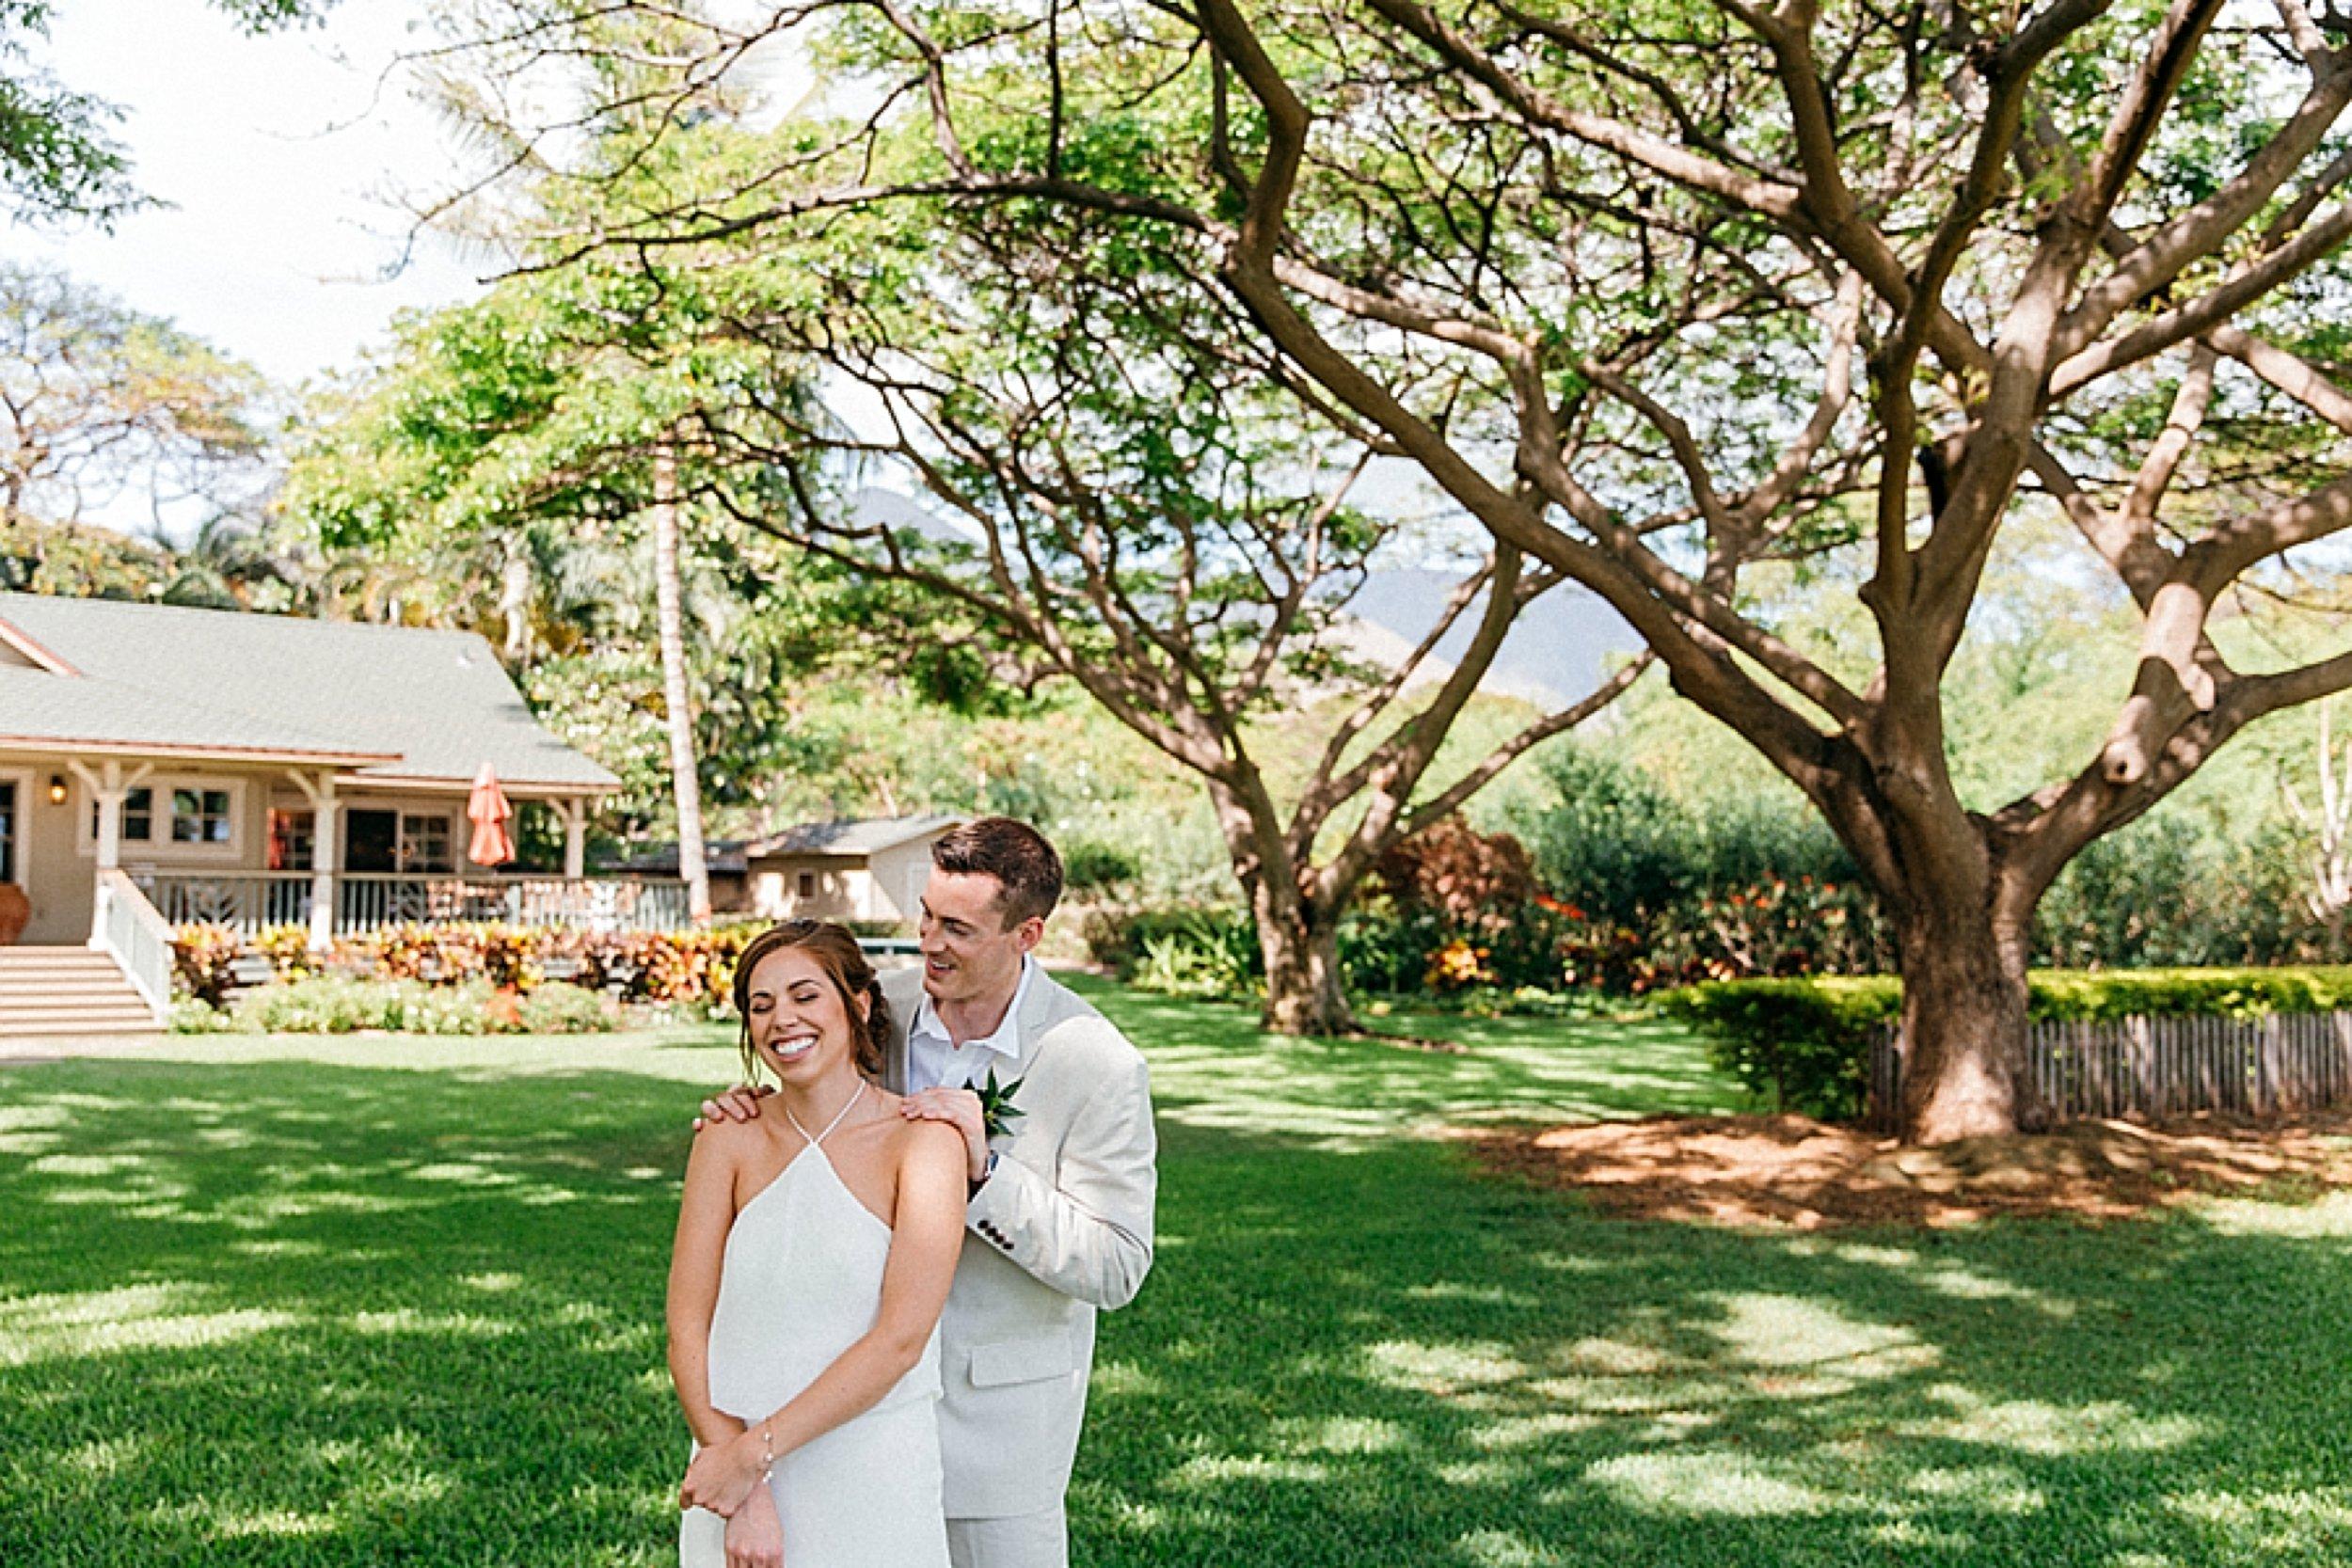 maui-wedding-at-olowalu-plantation-house_0038.jpg